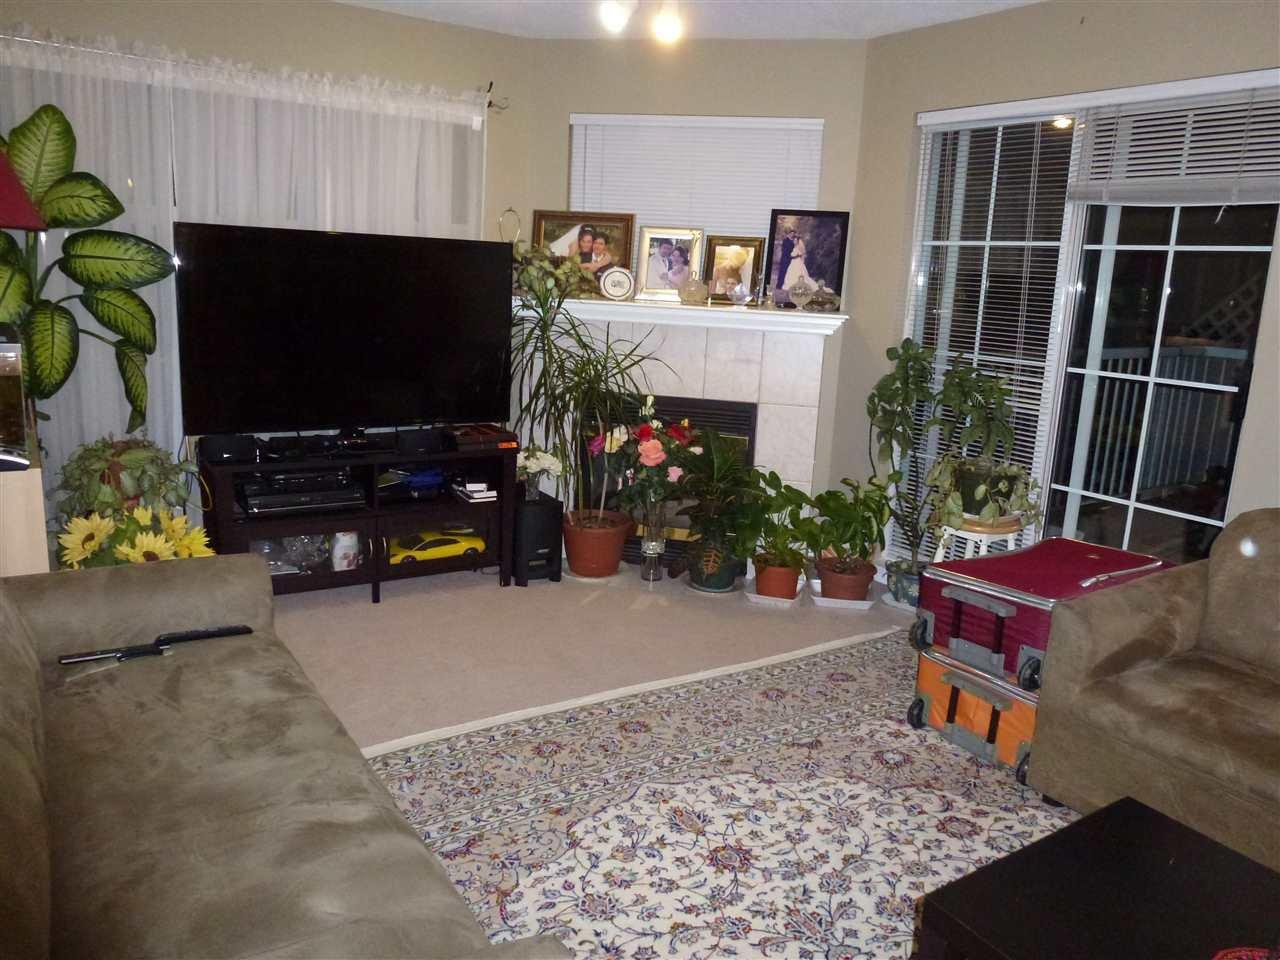 "Photo 5: Photos: 323 2678 DIXON Street in Port Coquitlam: Central Pt Coquitlam Condo for sale in ""SPRINGDALE"" : MLS®# R2041724"